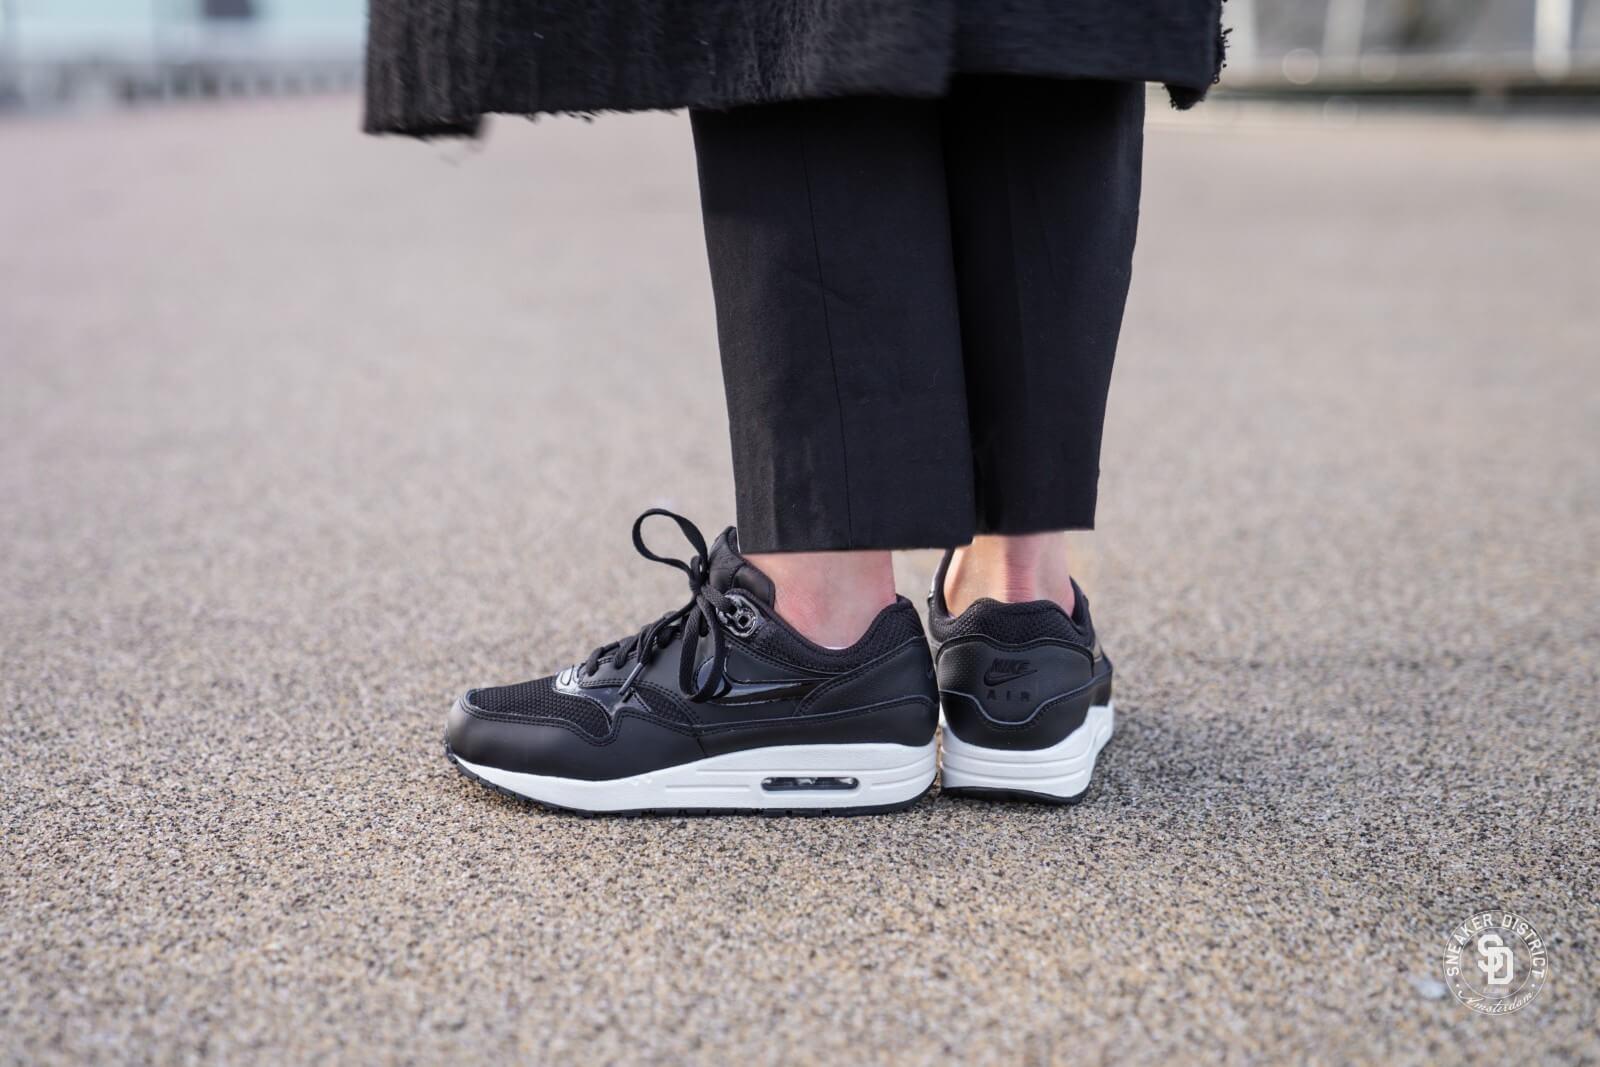 Nike Women's Air Max 1 BlackBlack Summit White